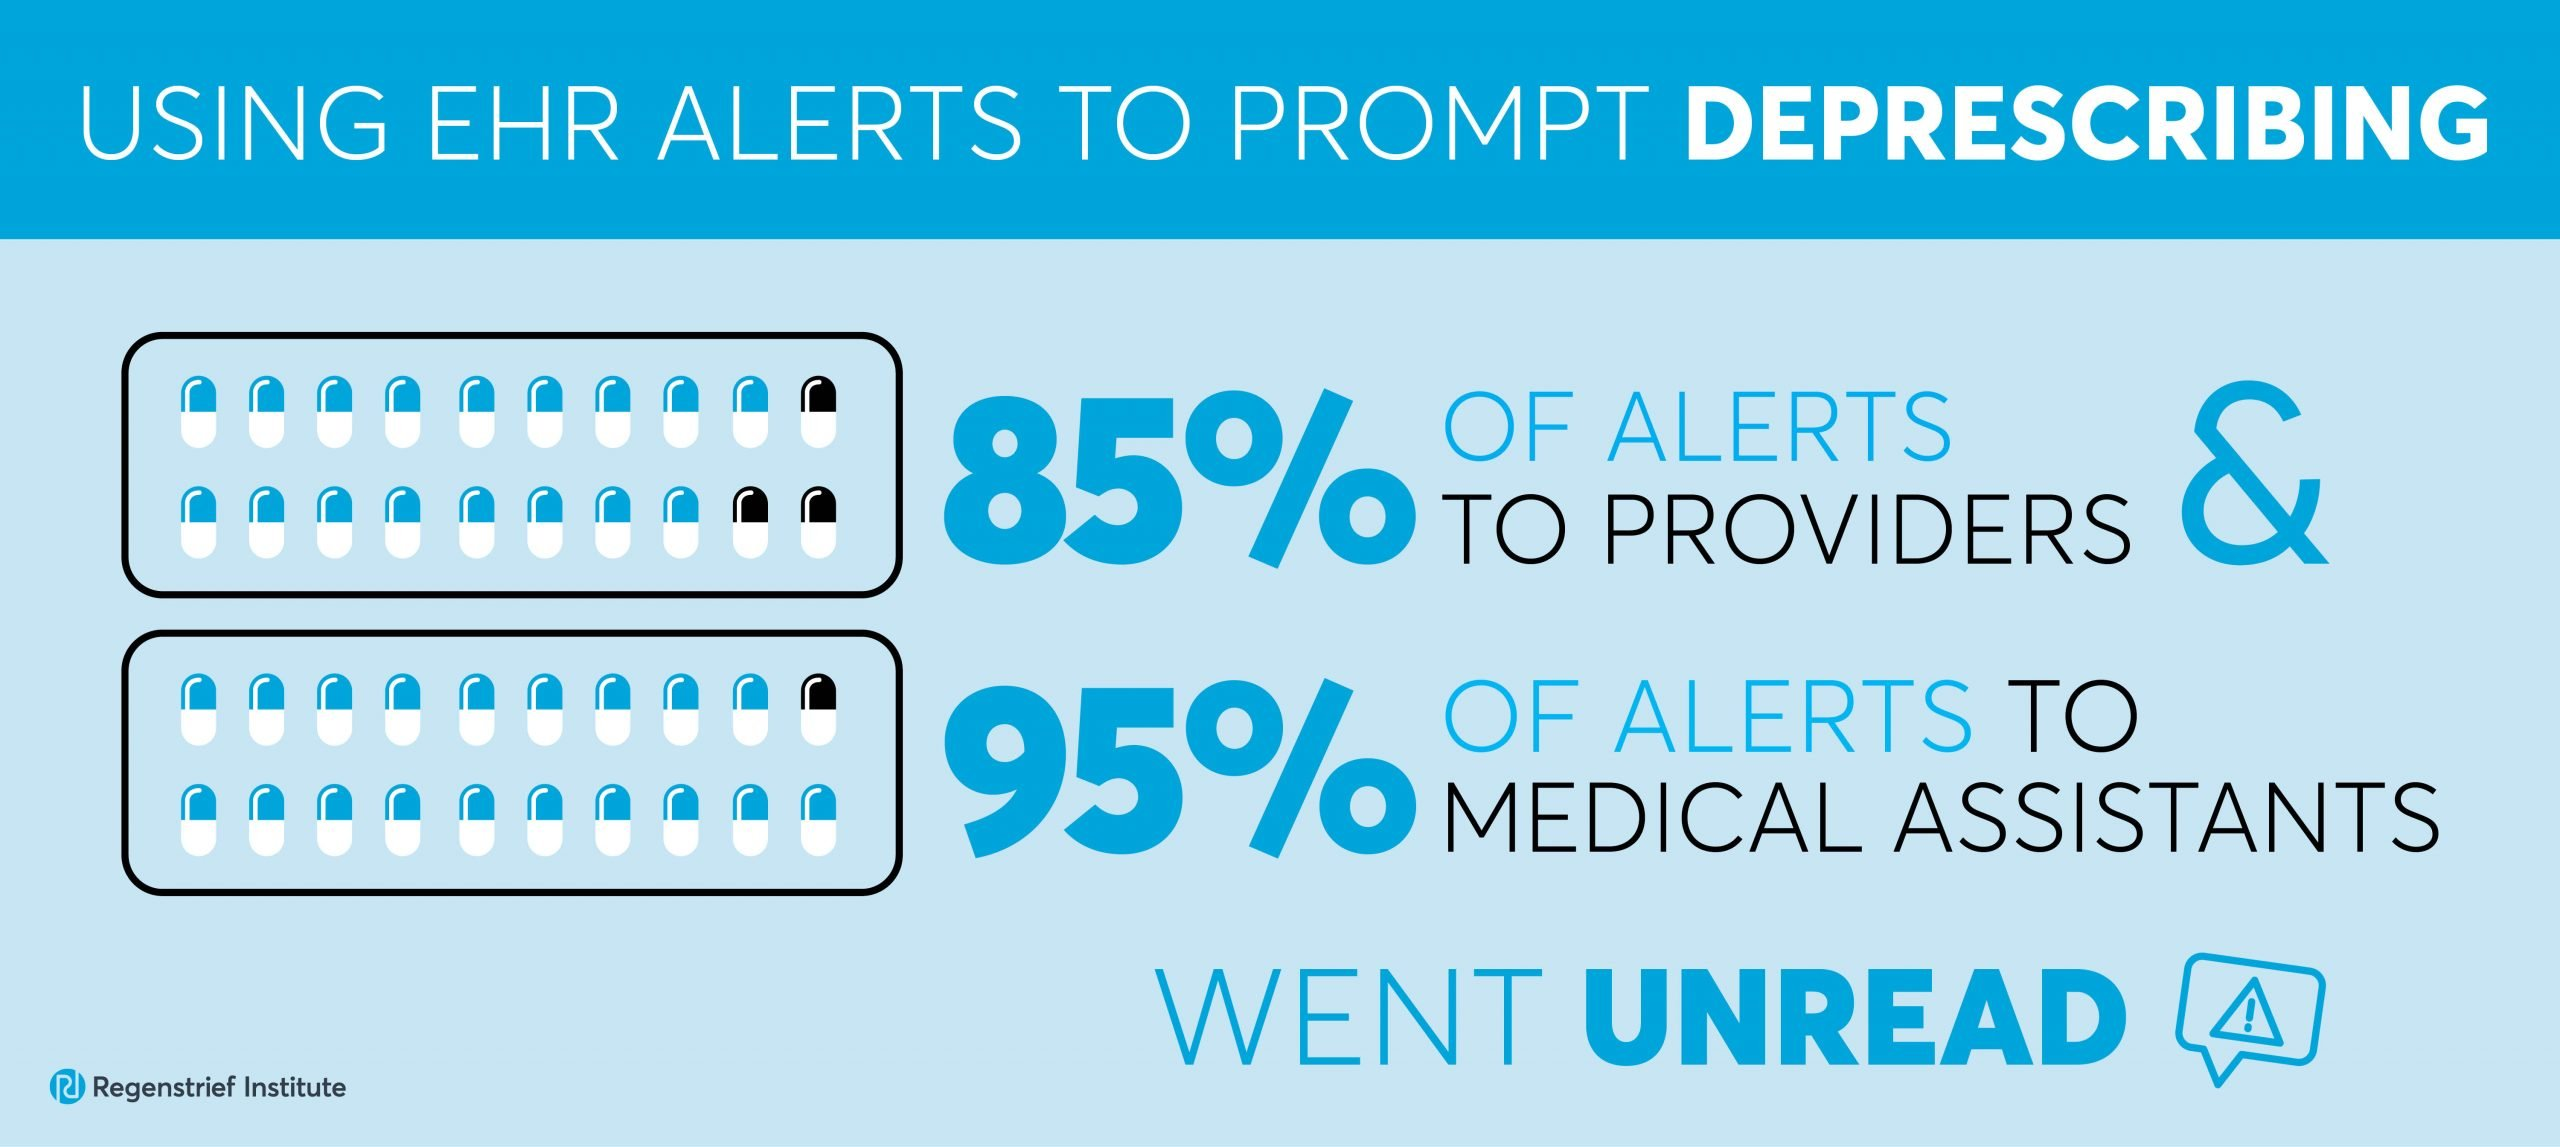 EHR alerts go unread, do not lead to deprescribing of medicines linked to dementia